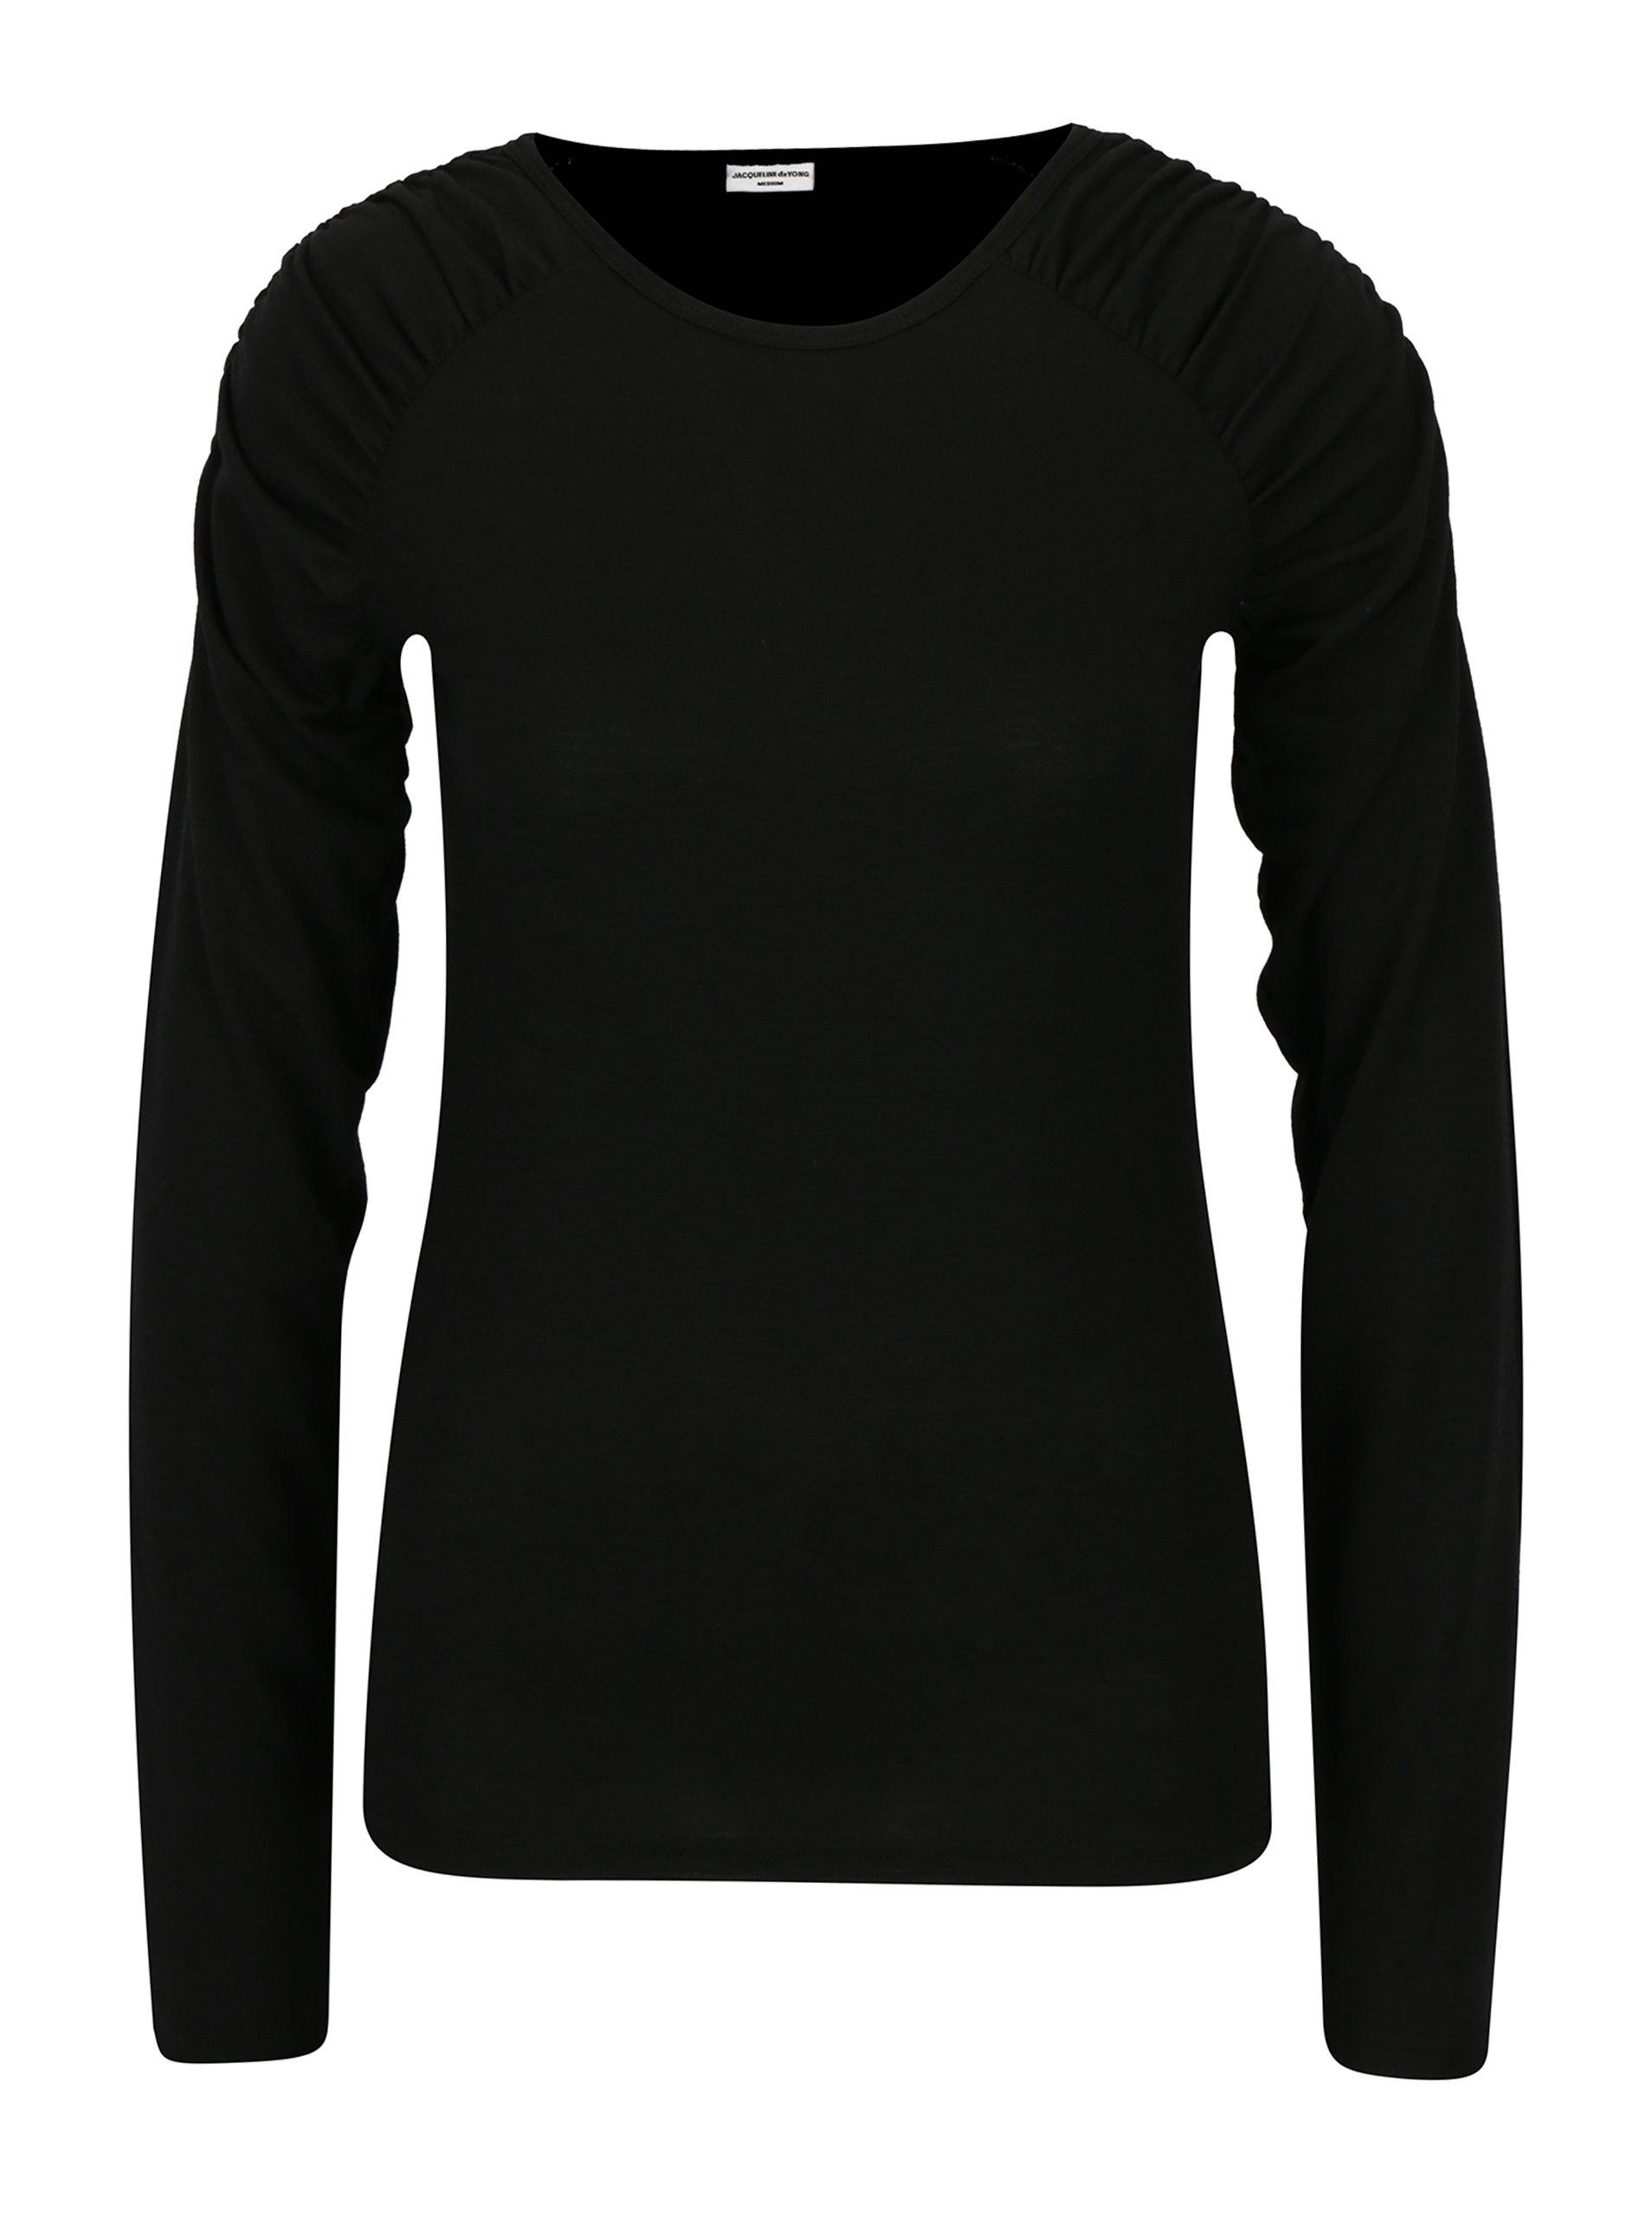 Černé tričko s řasením na ramenou Jacqueline de Yong Adora